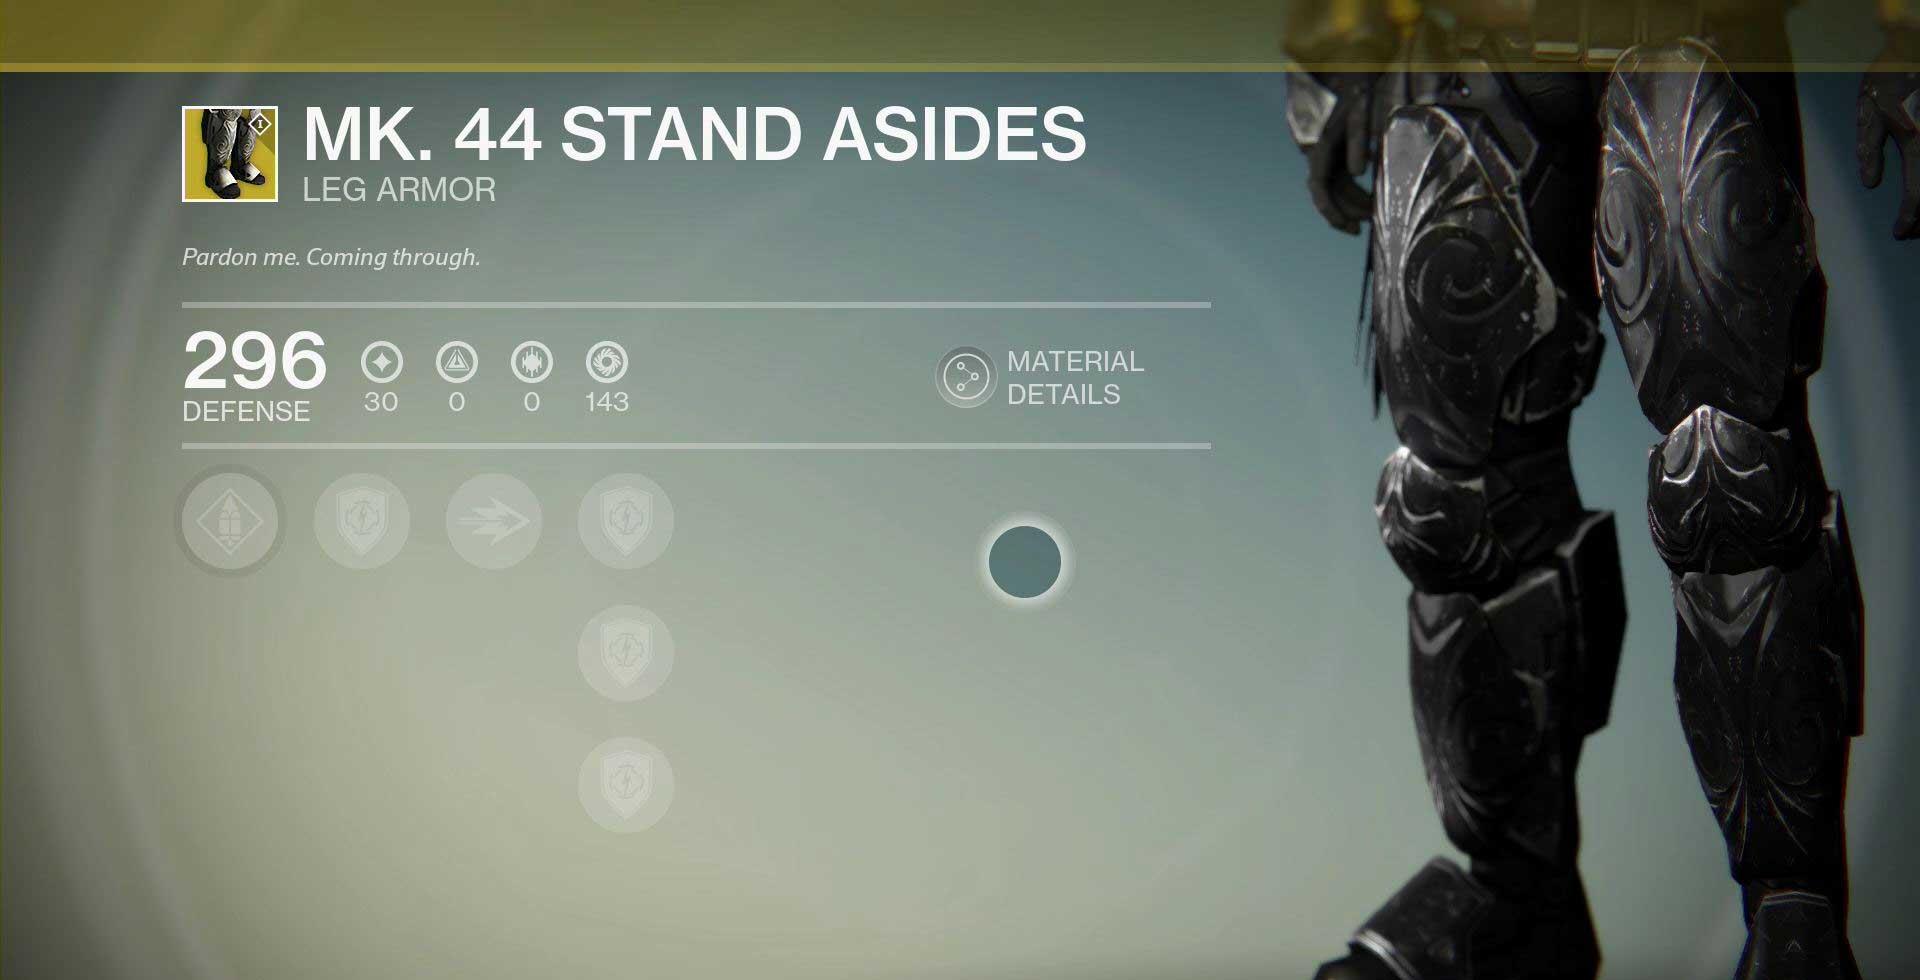 MK. 44 Stand Asides Titan Leg Armor